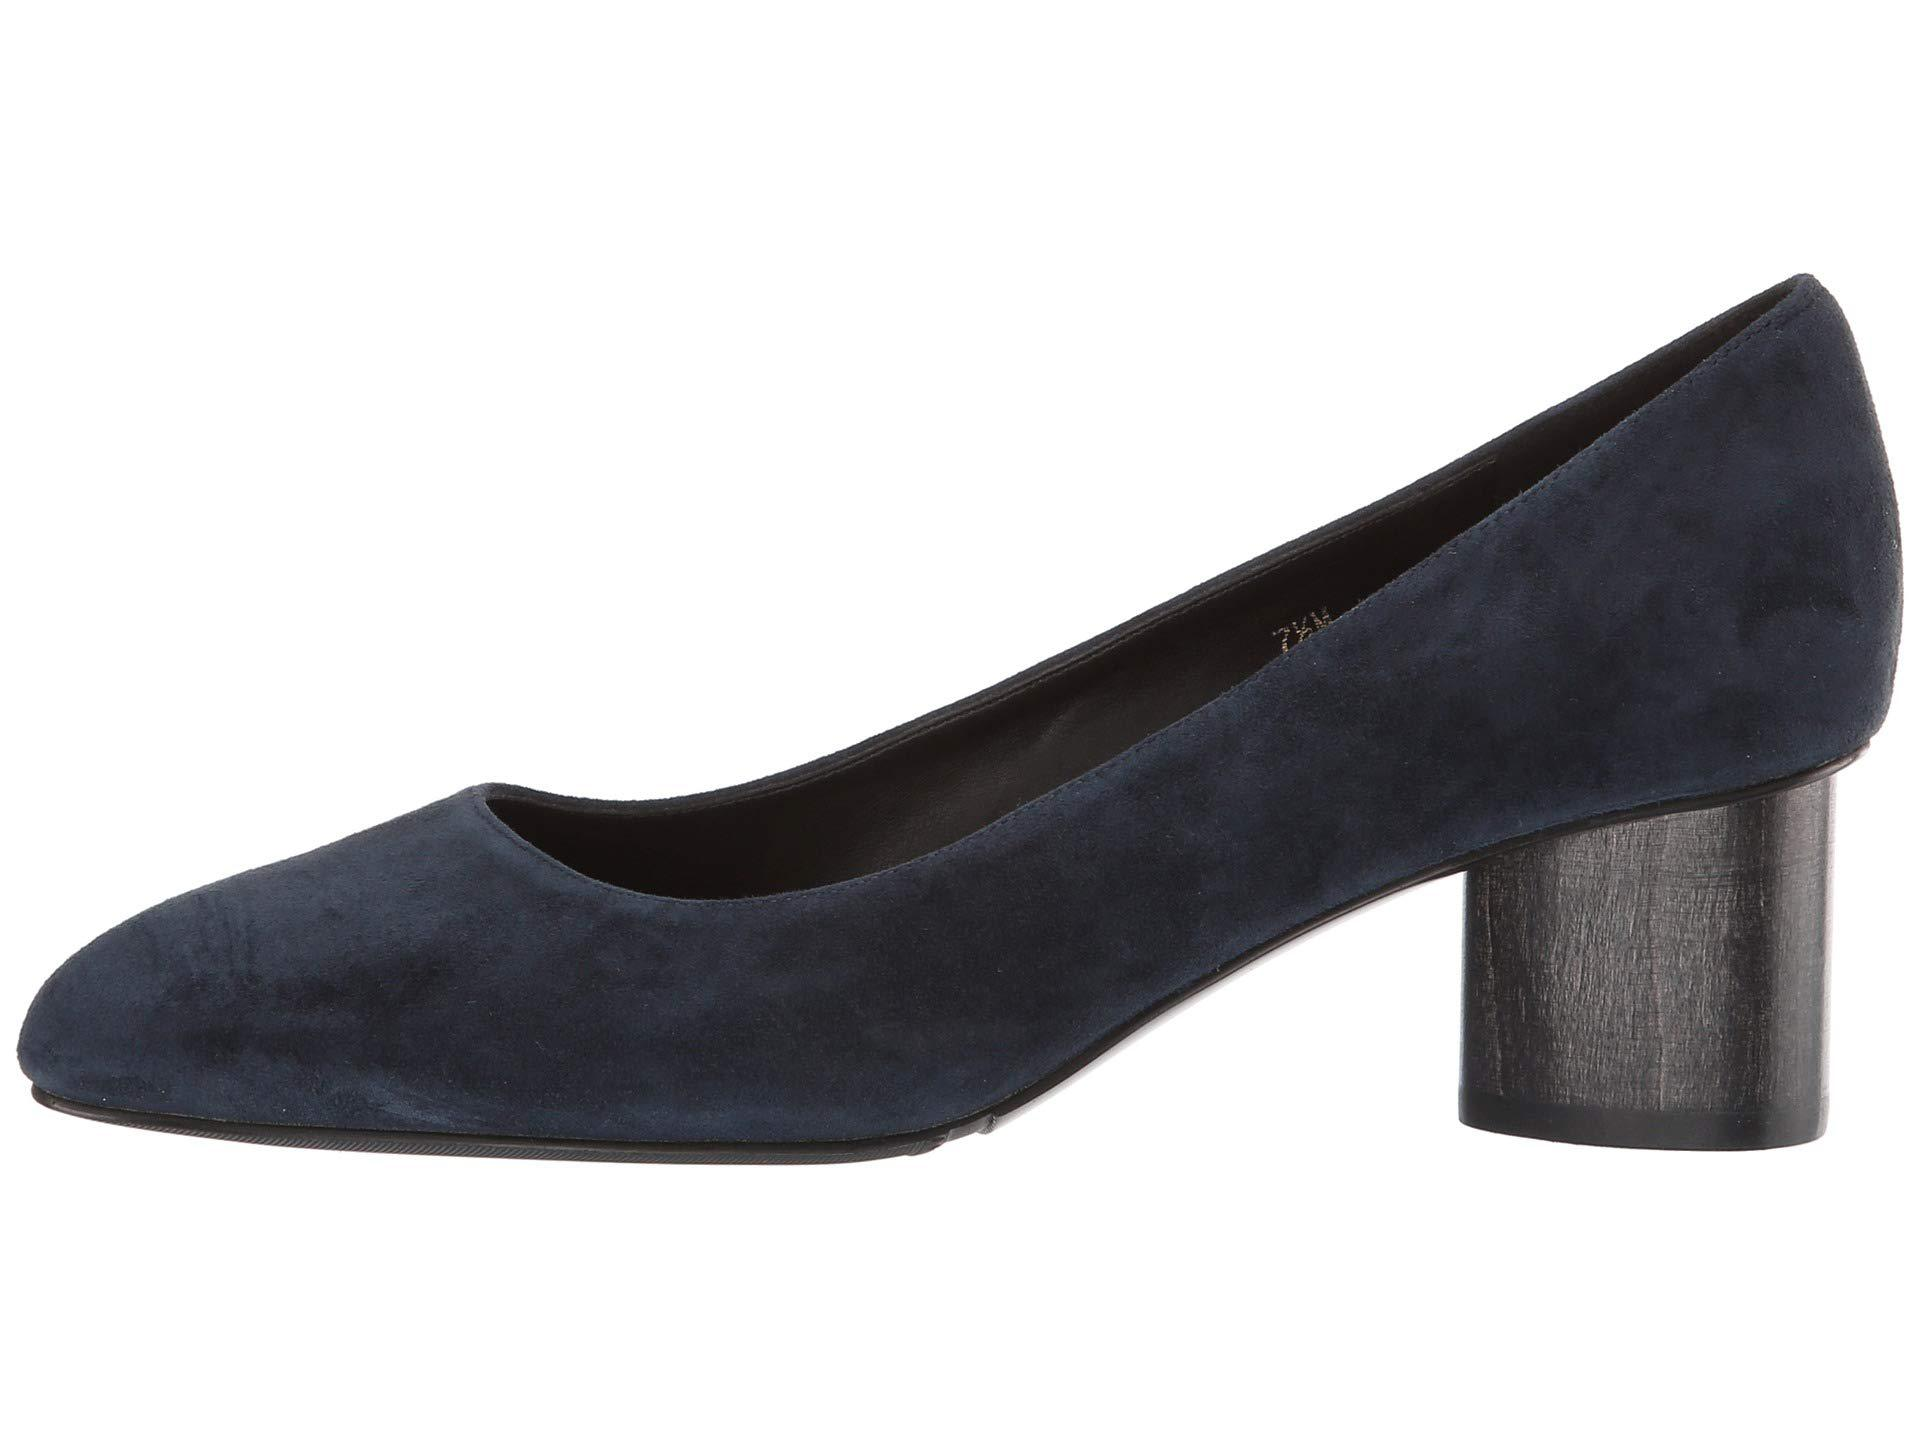 Tamaris Leather Pontius 1 1 22471 20 in Navy Leather (Blue